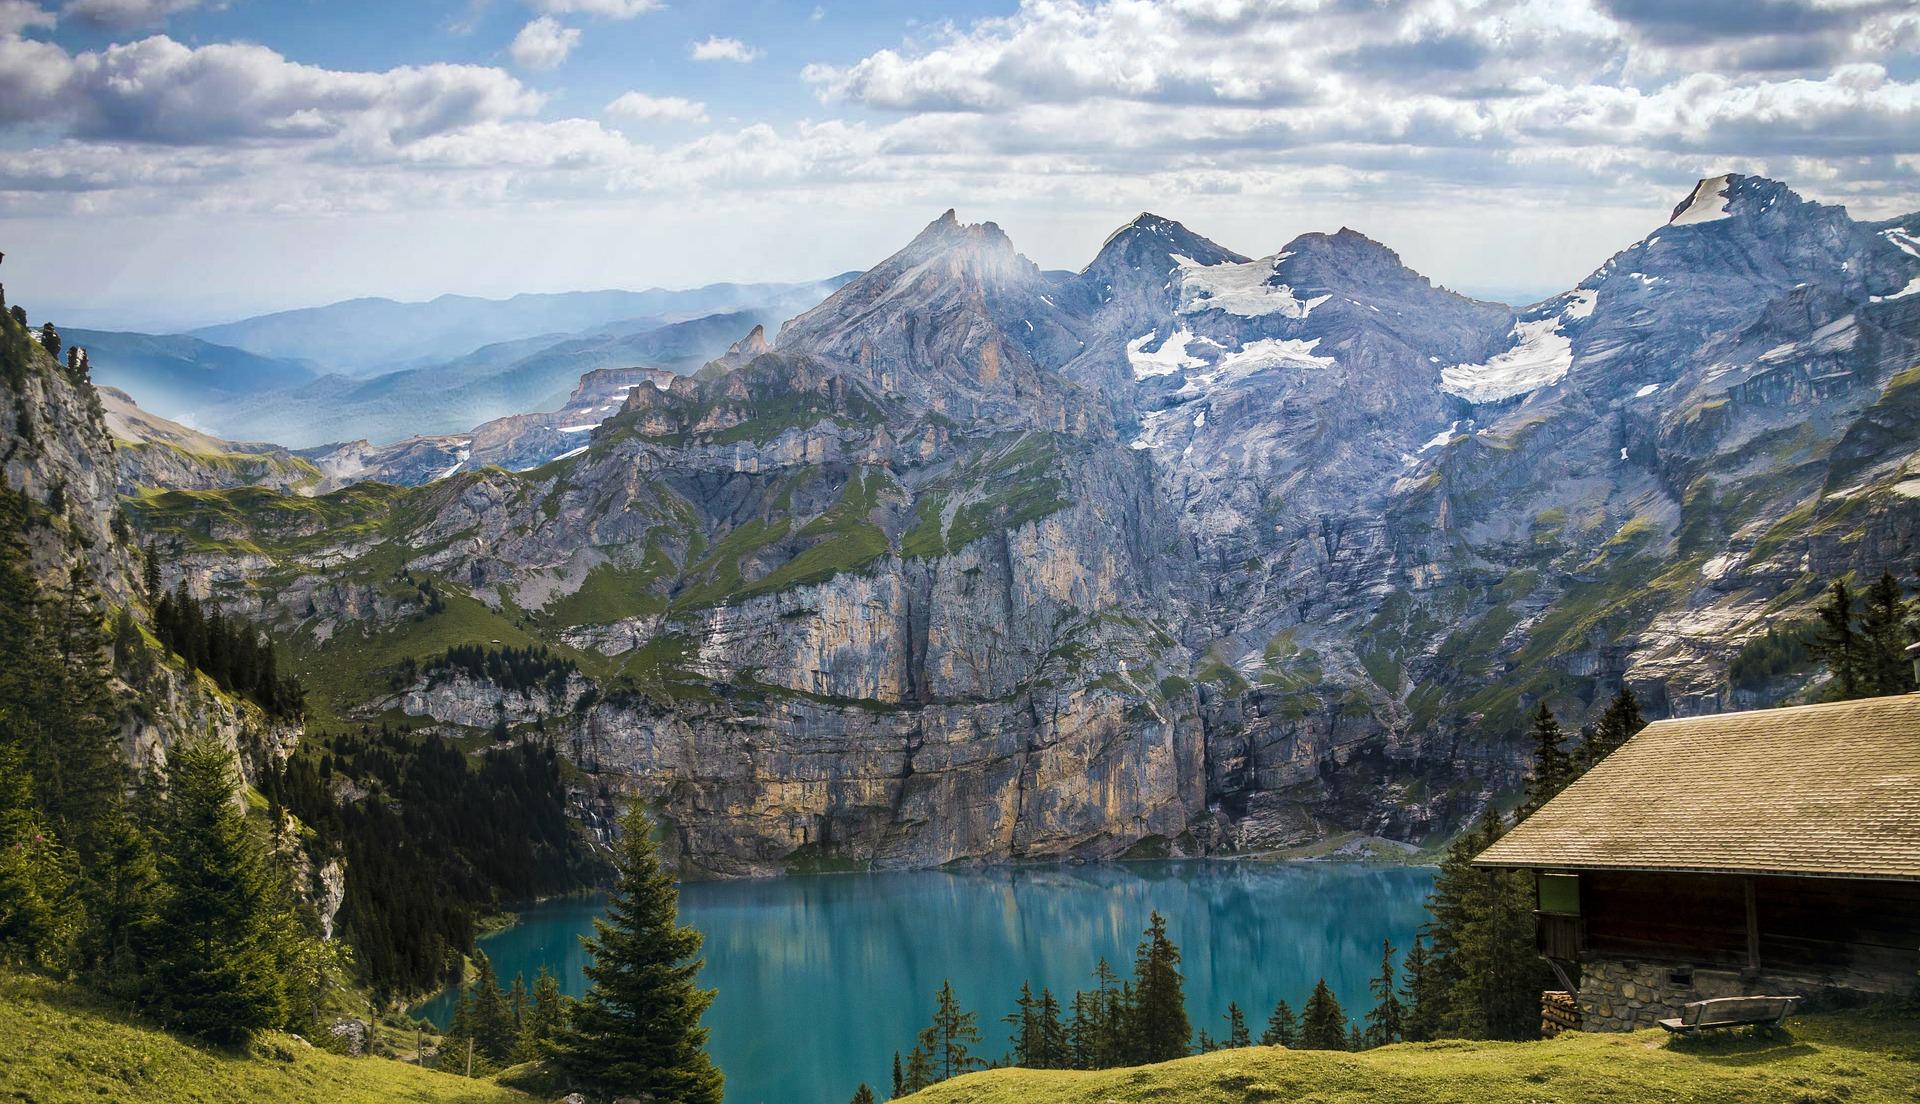 mountains-1645078_1920.jpg